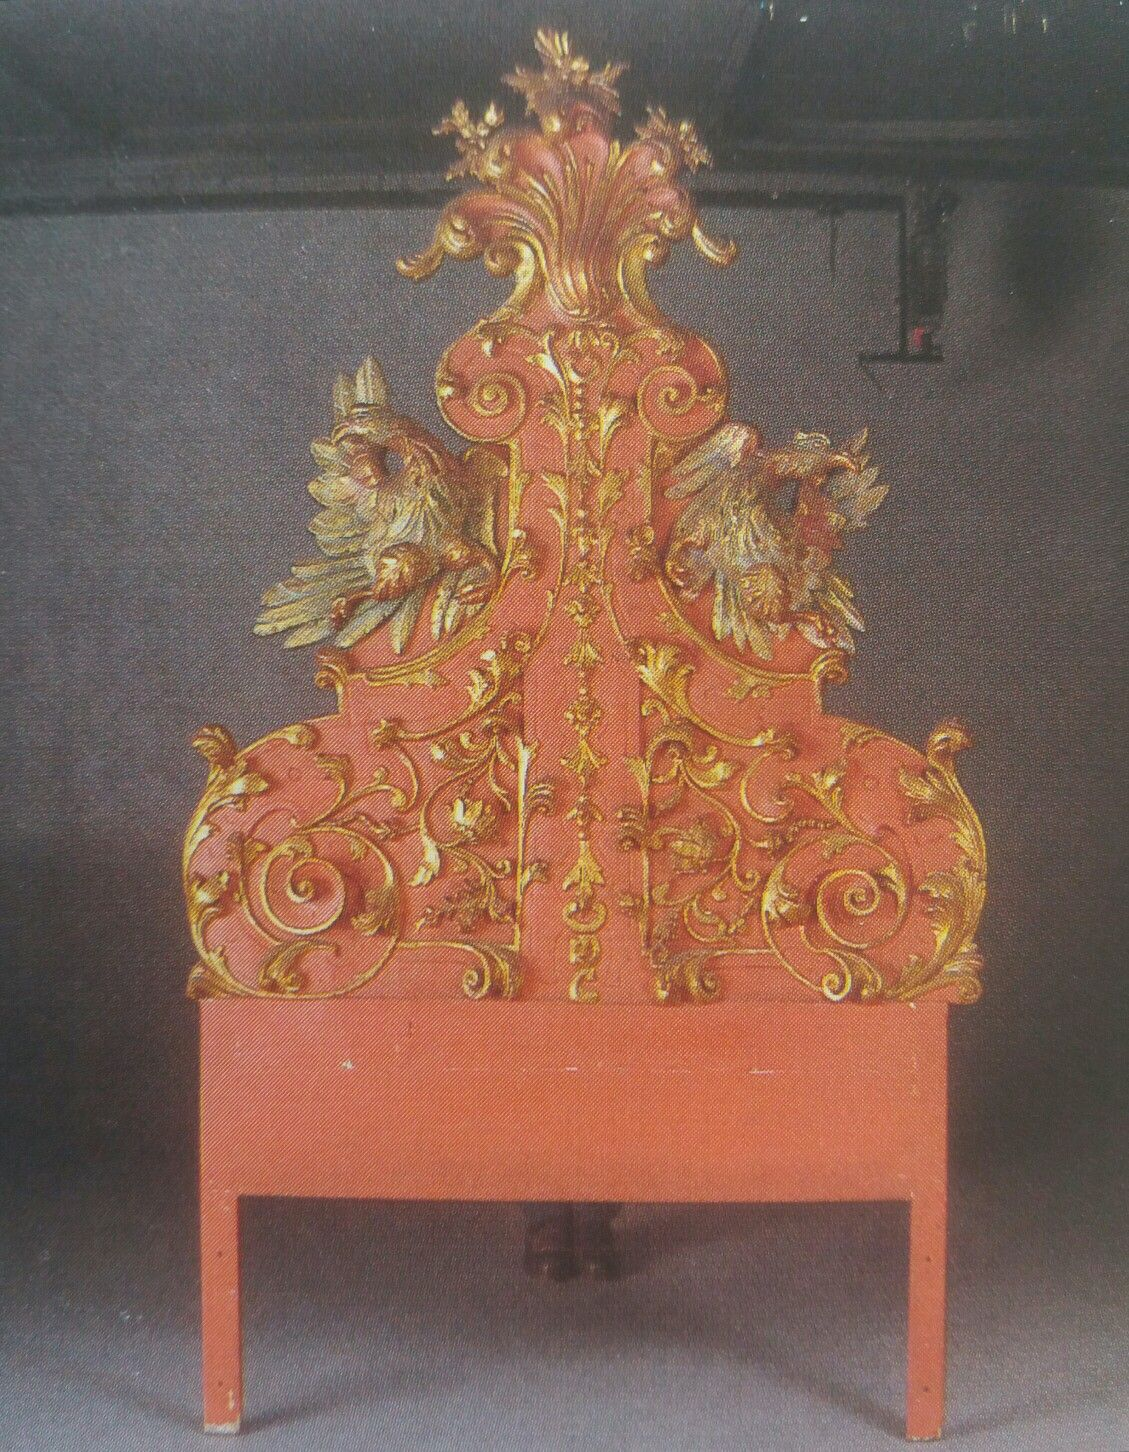 Cabeceira De Cama Estilo Barroco 160x270cm Fr Pinterest  # Barre Duque Muebles